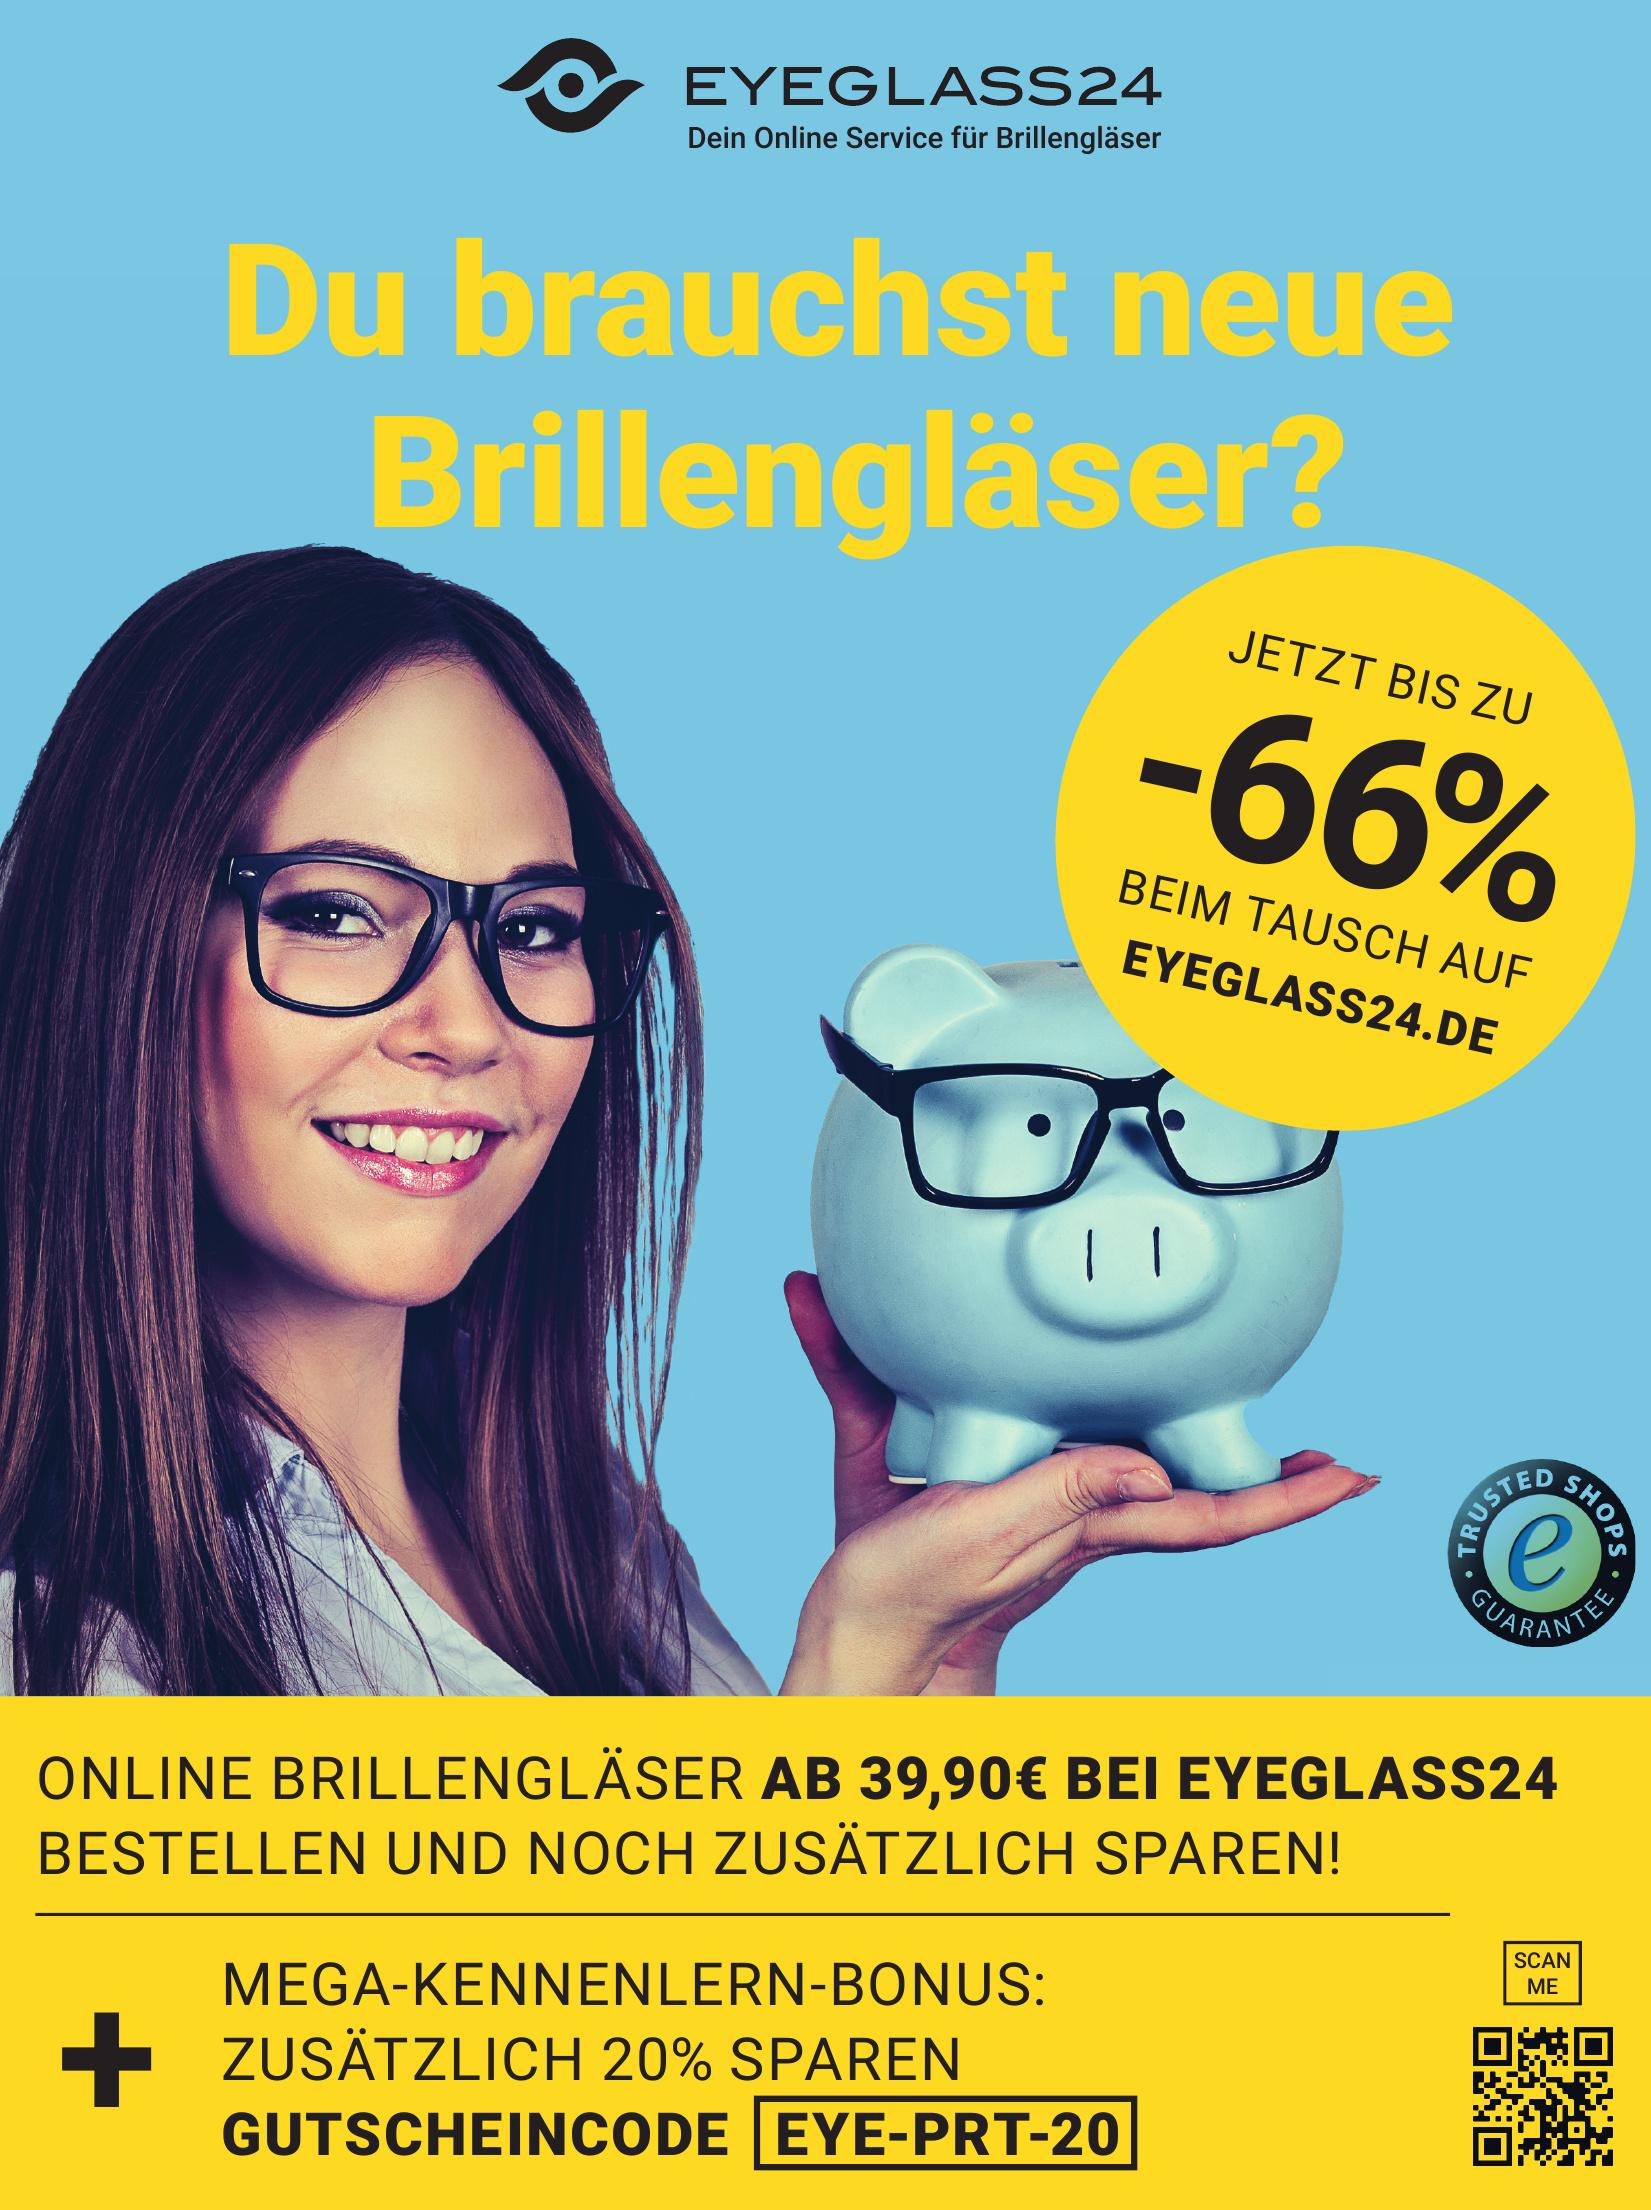 Eyeglass24